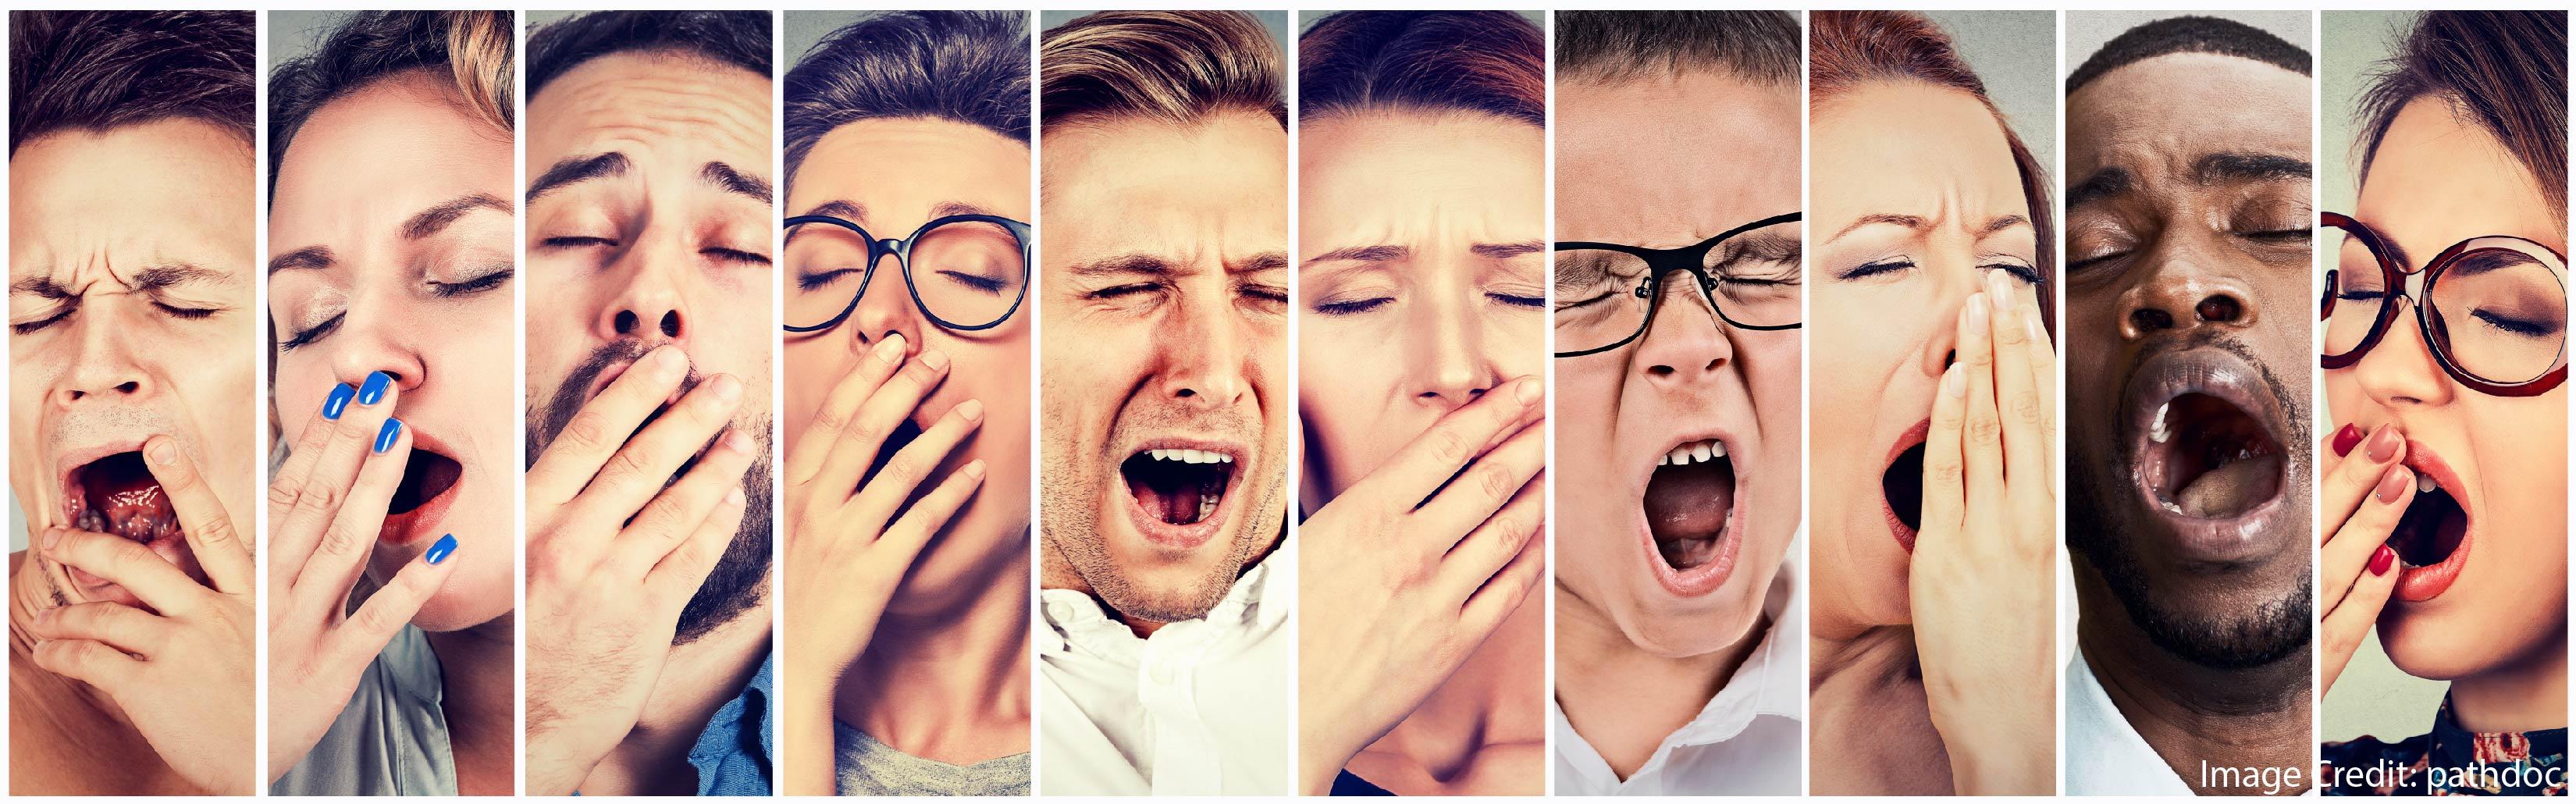 sleeplessness harms women